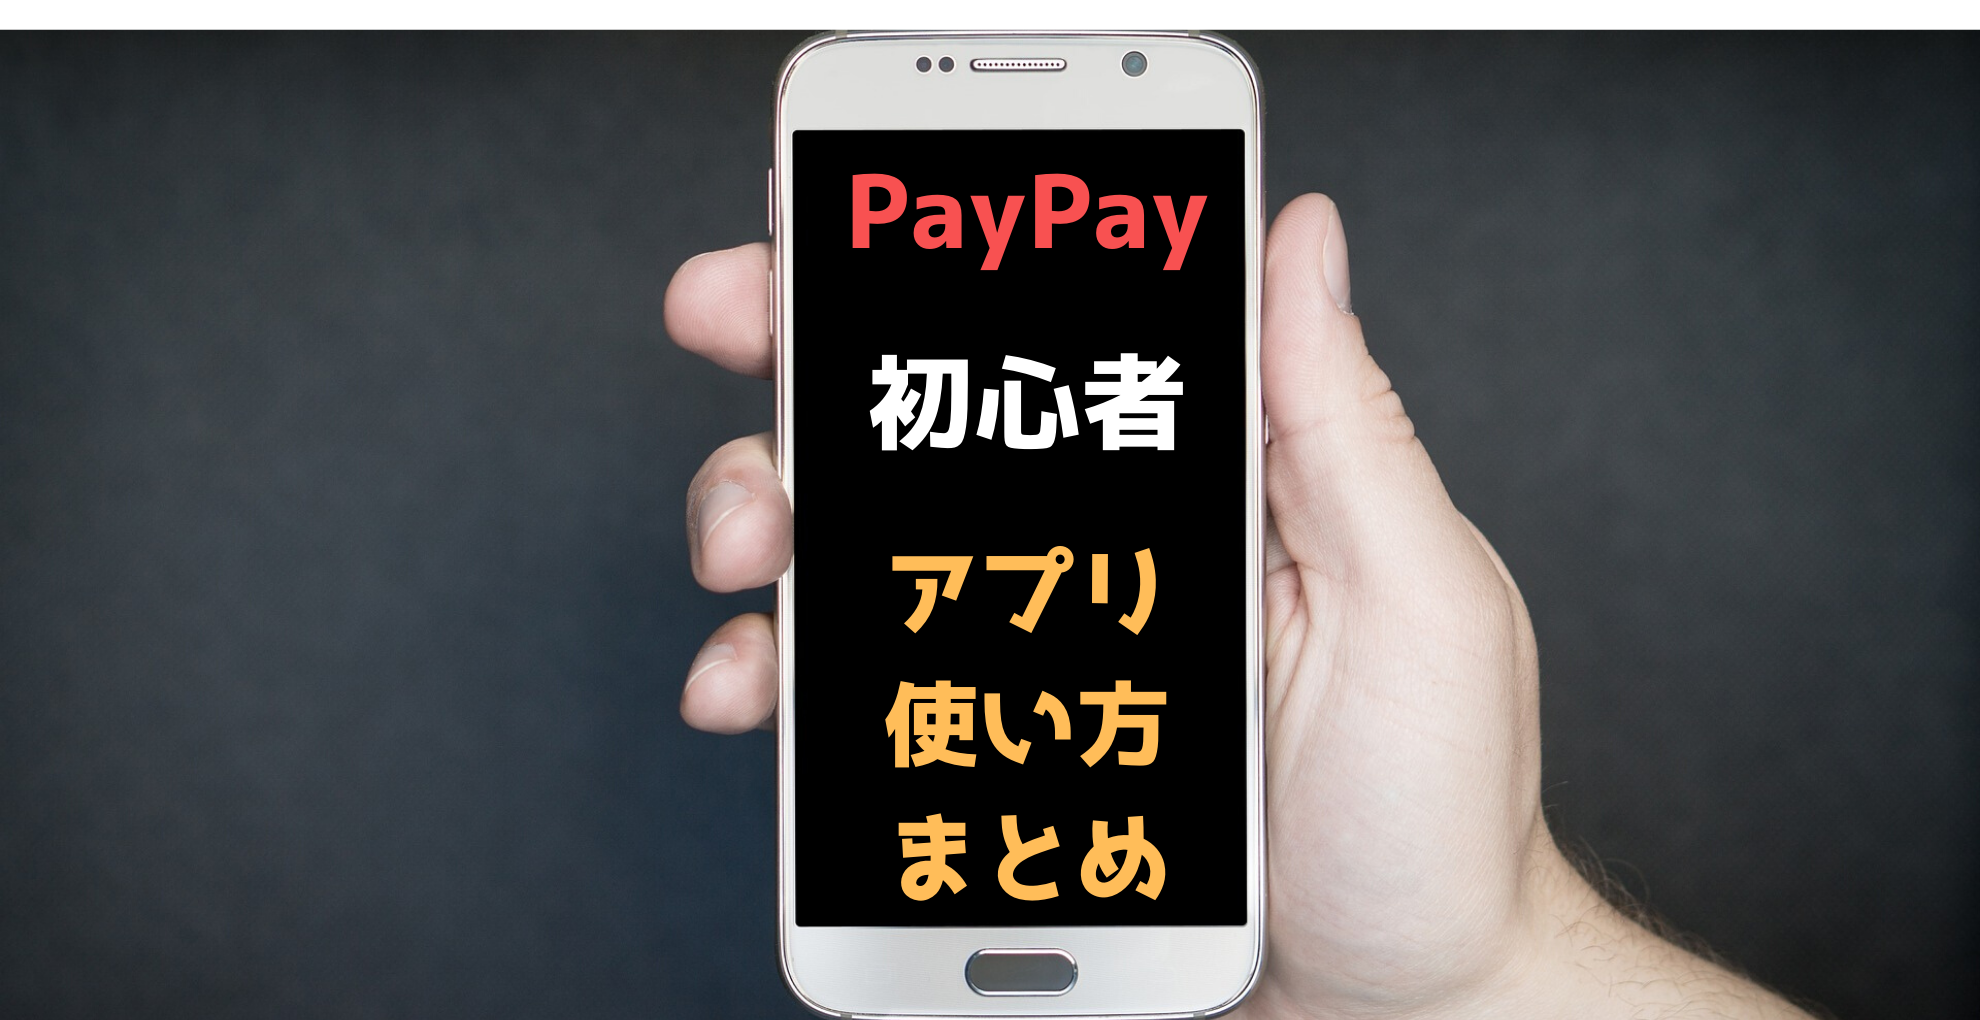 【PayPay】未経験者&初心者向け 基本の使い方まとめ